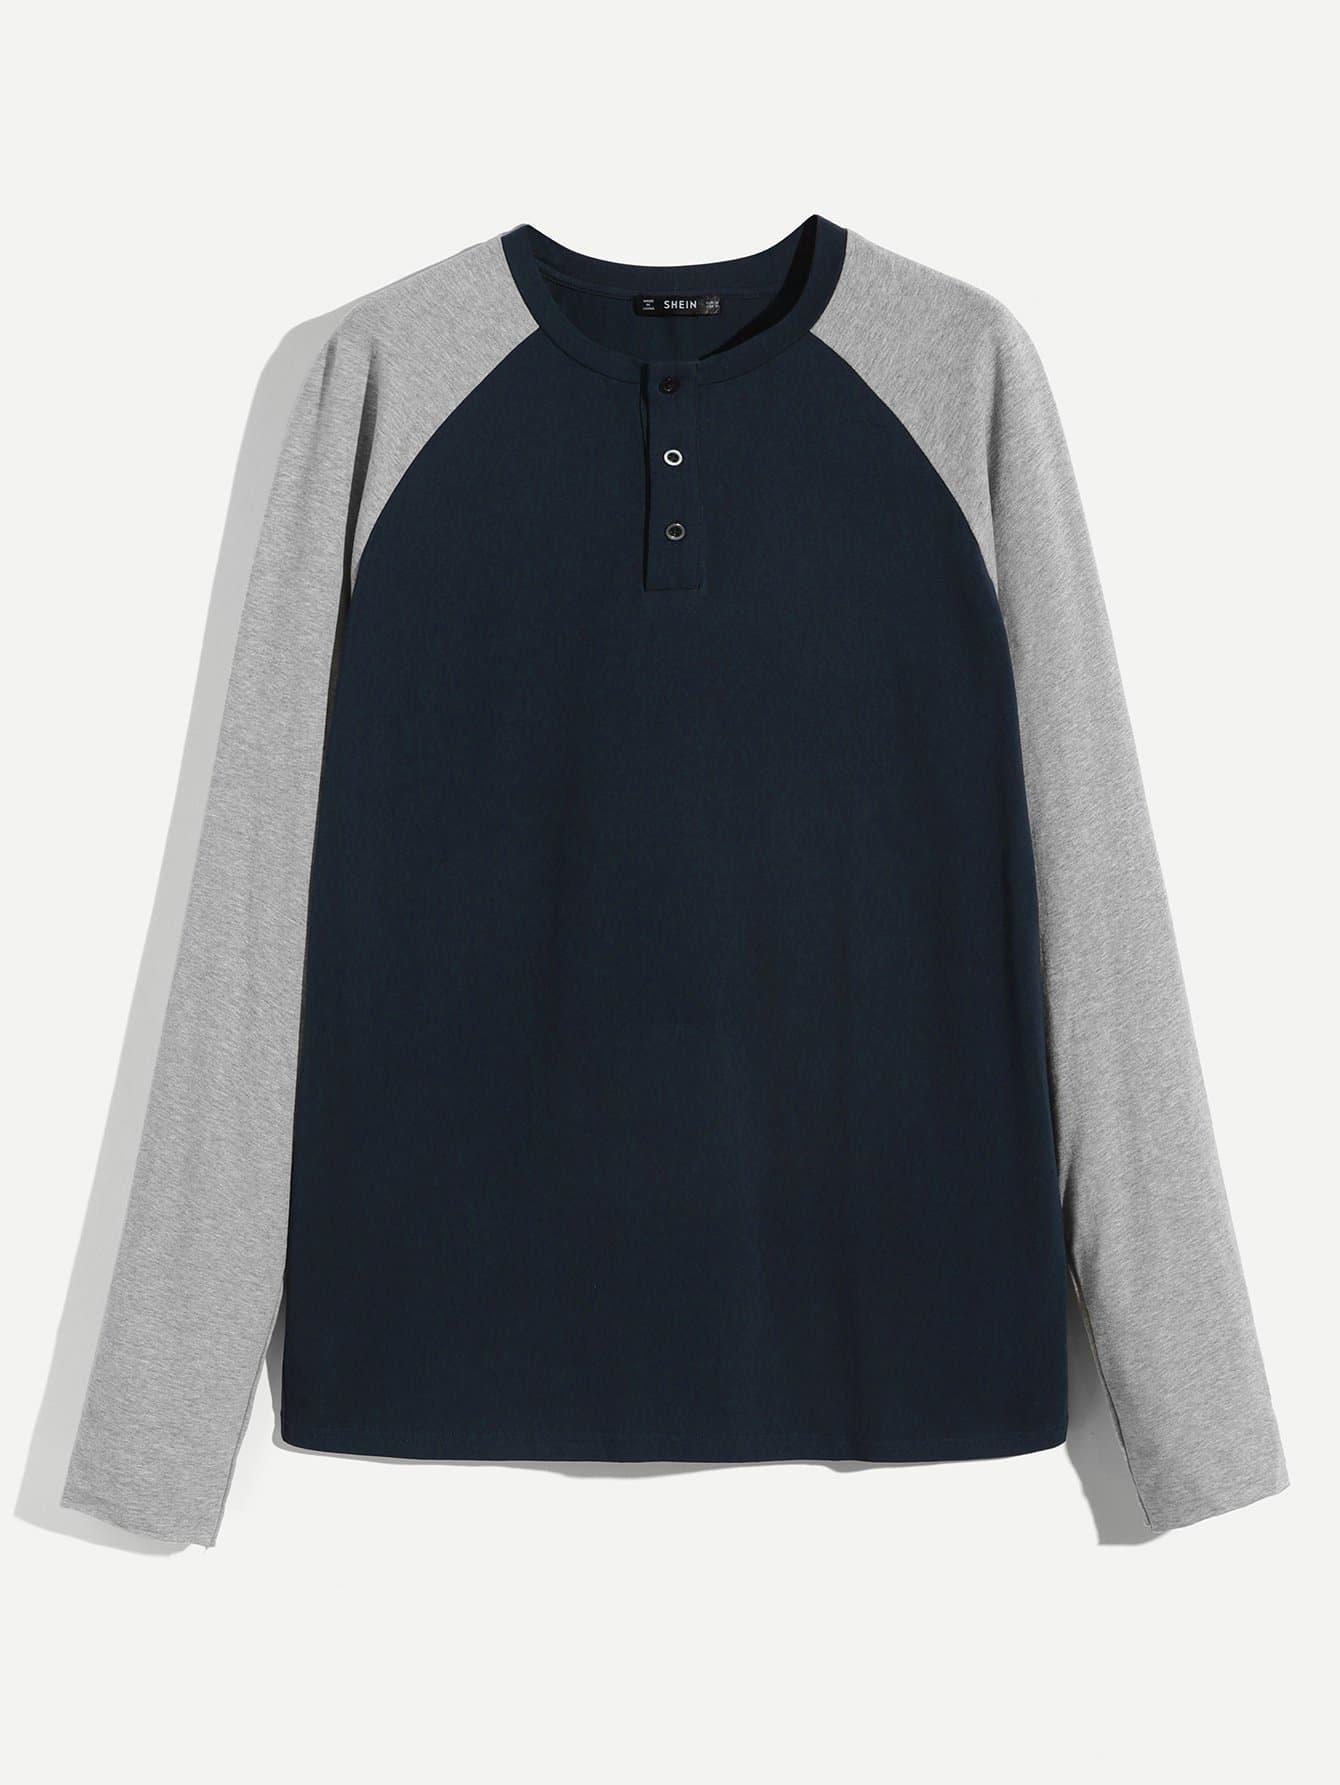 Купить Для мужчин футболка на пуговицах с регланом-рукавом, null, SheIn